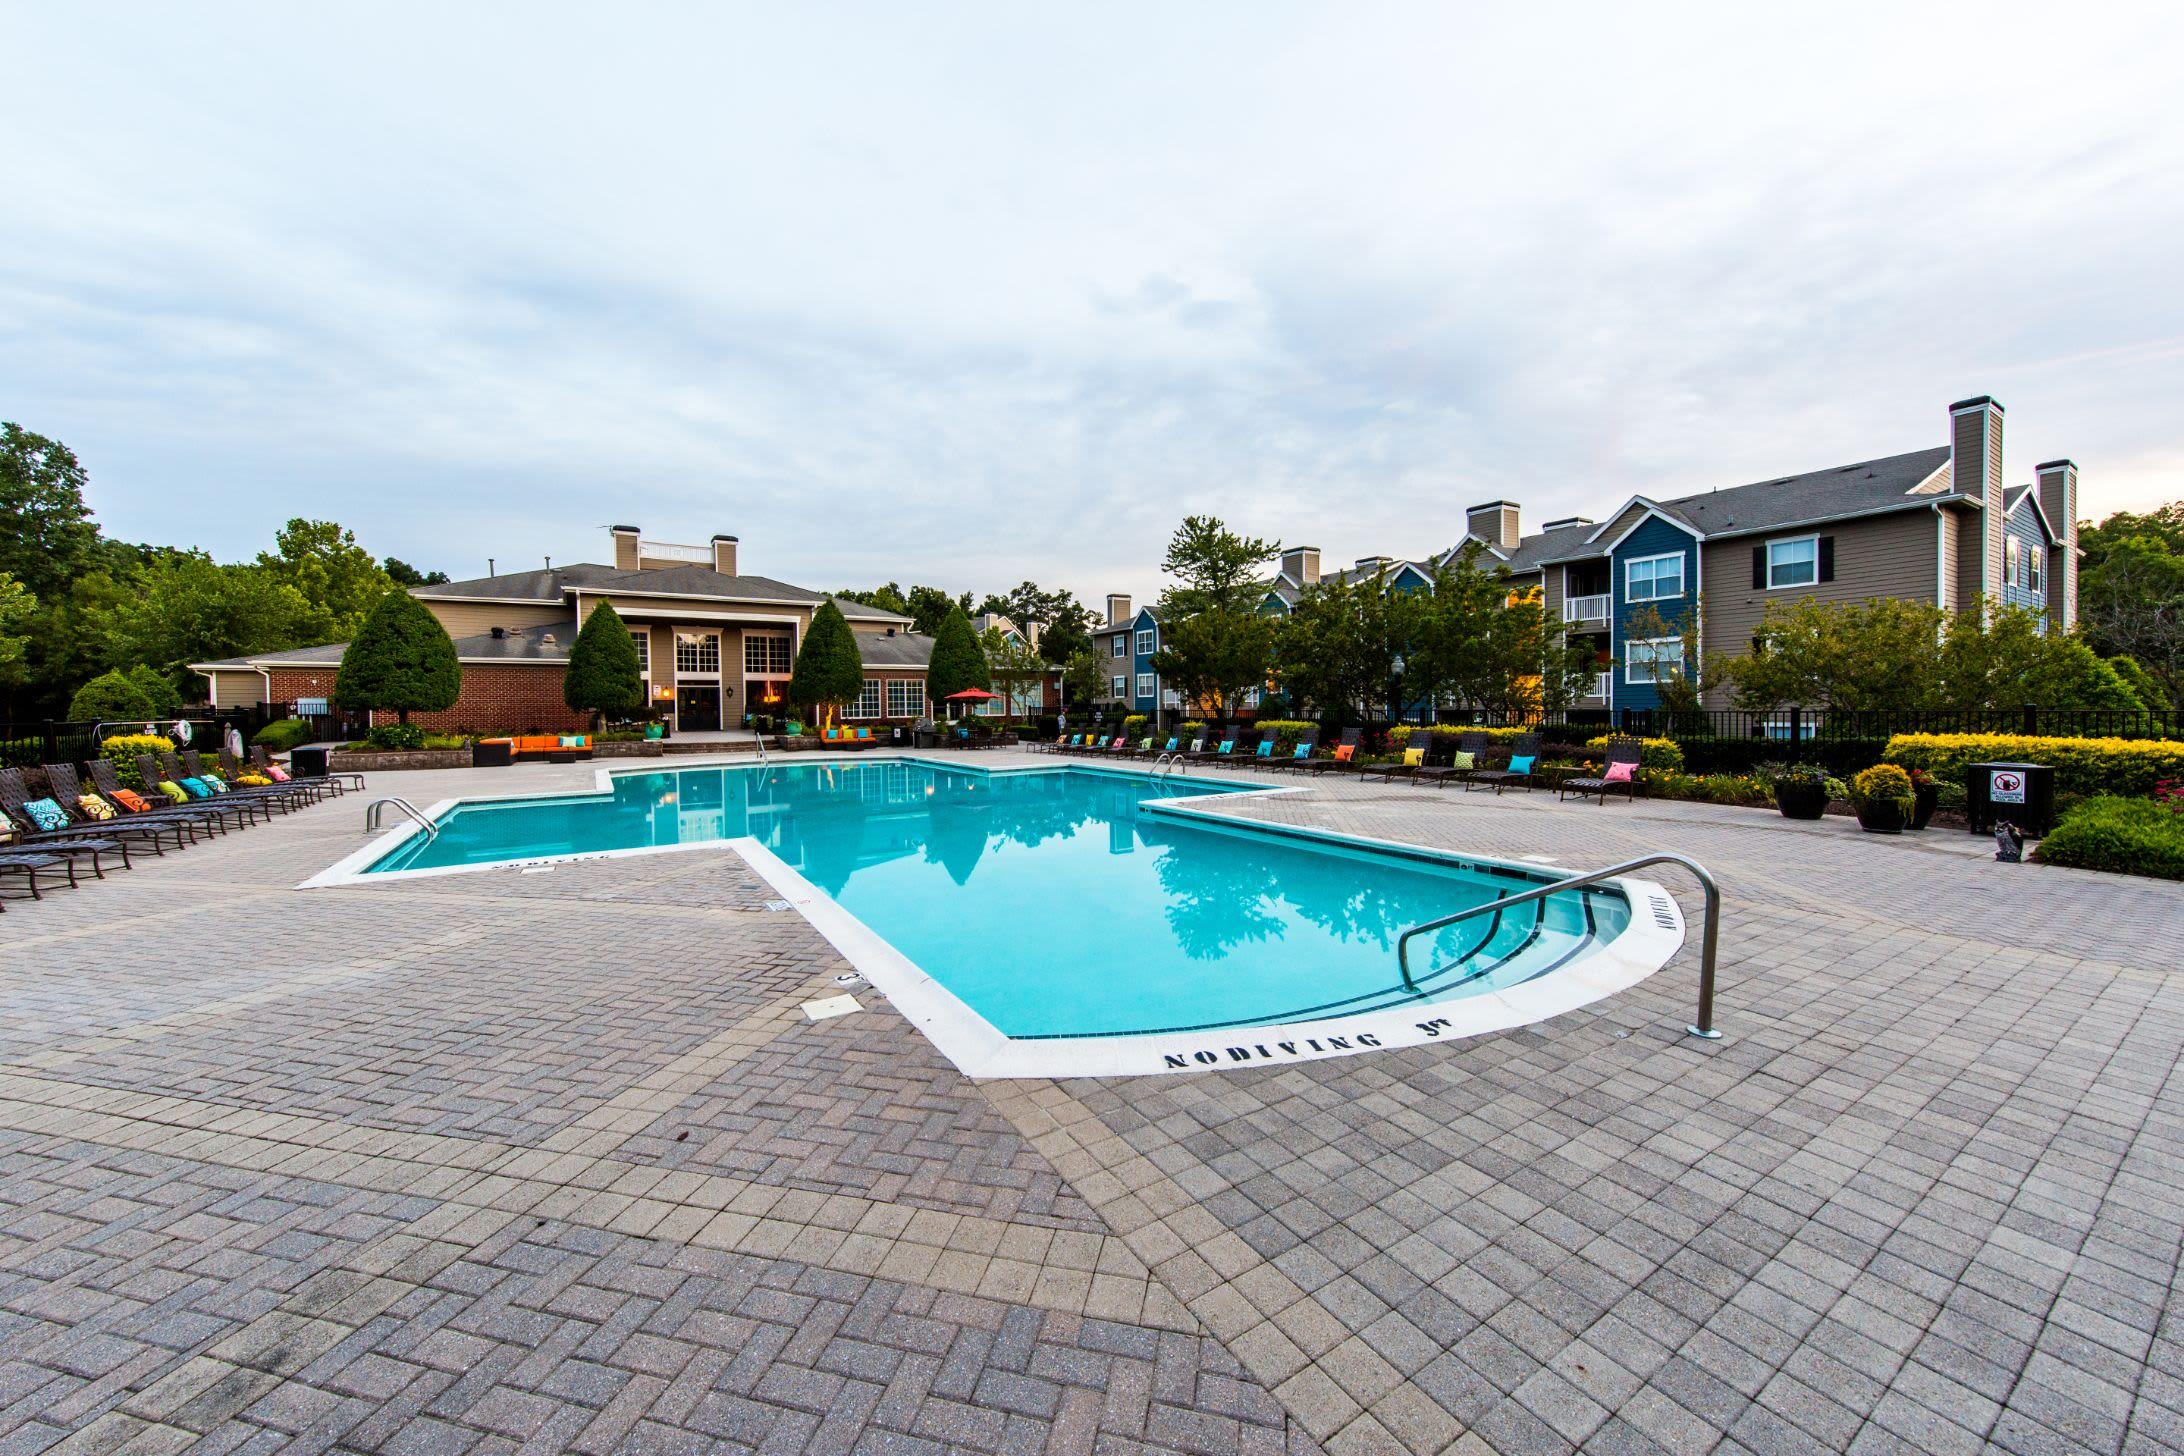 Large outdoor swimming pool at Marquis at Silverton in Cary, North Carolina